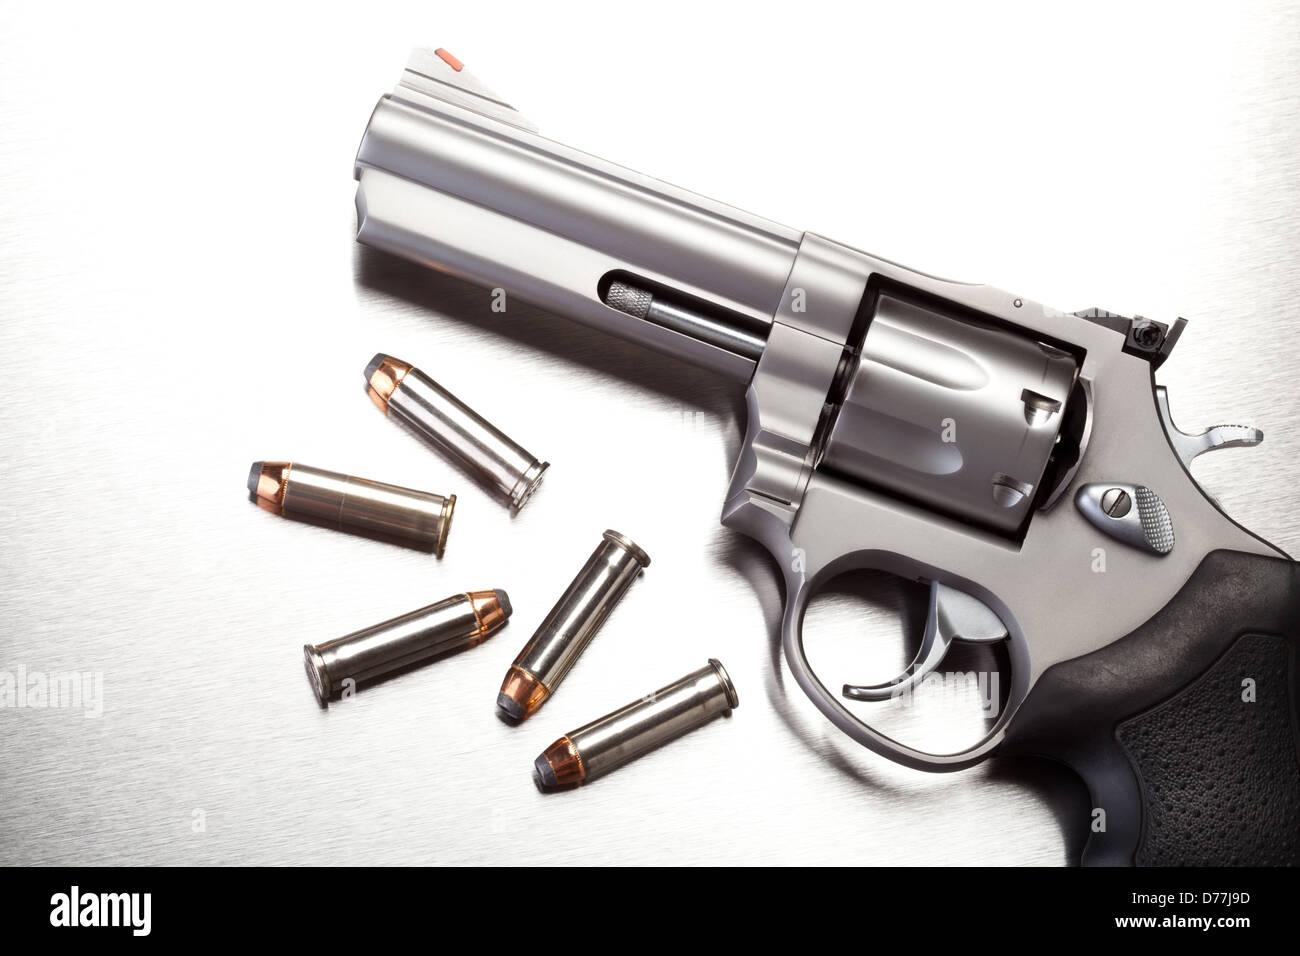 gun with bullets on steel surface - modern revolver handgun - Stock Image